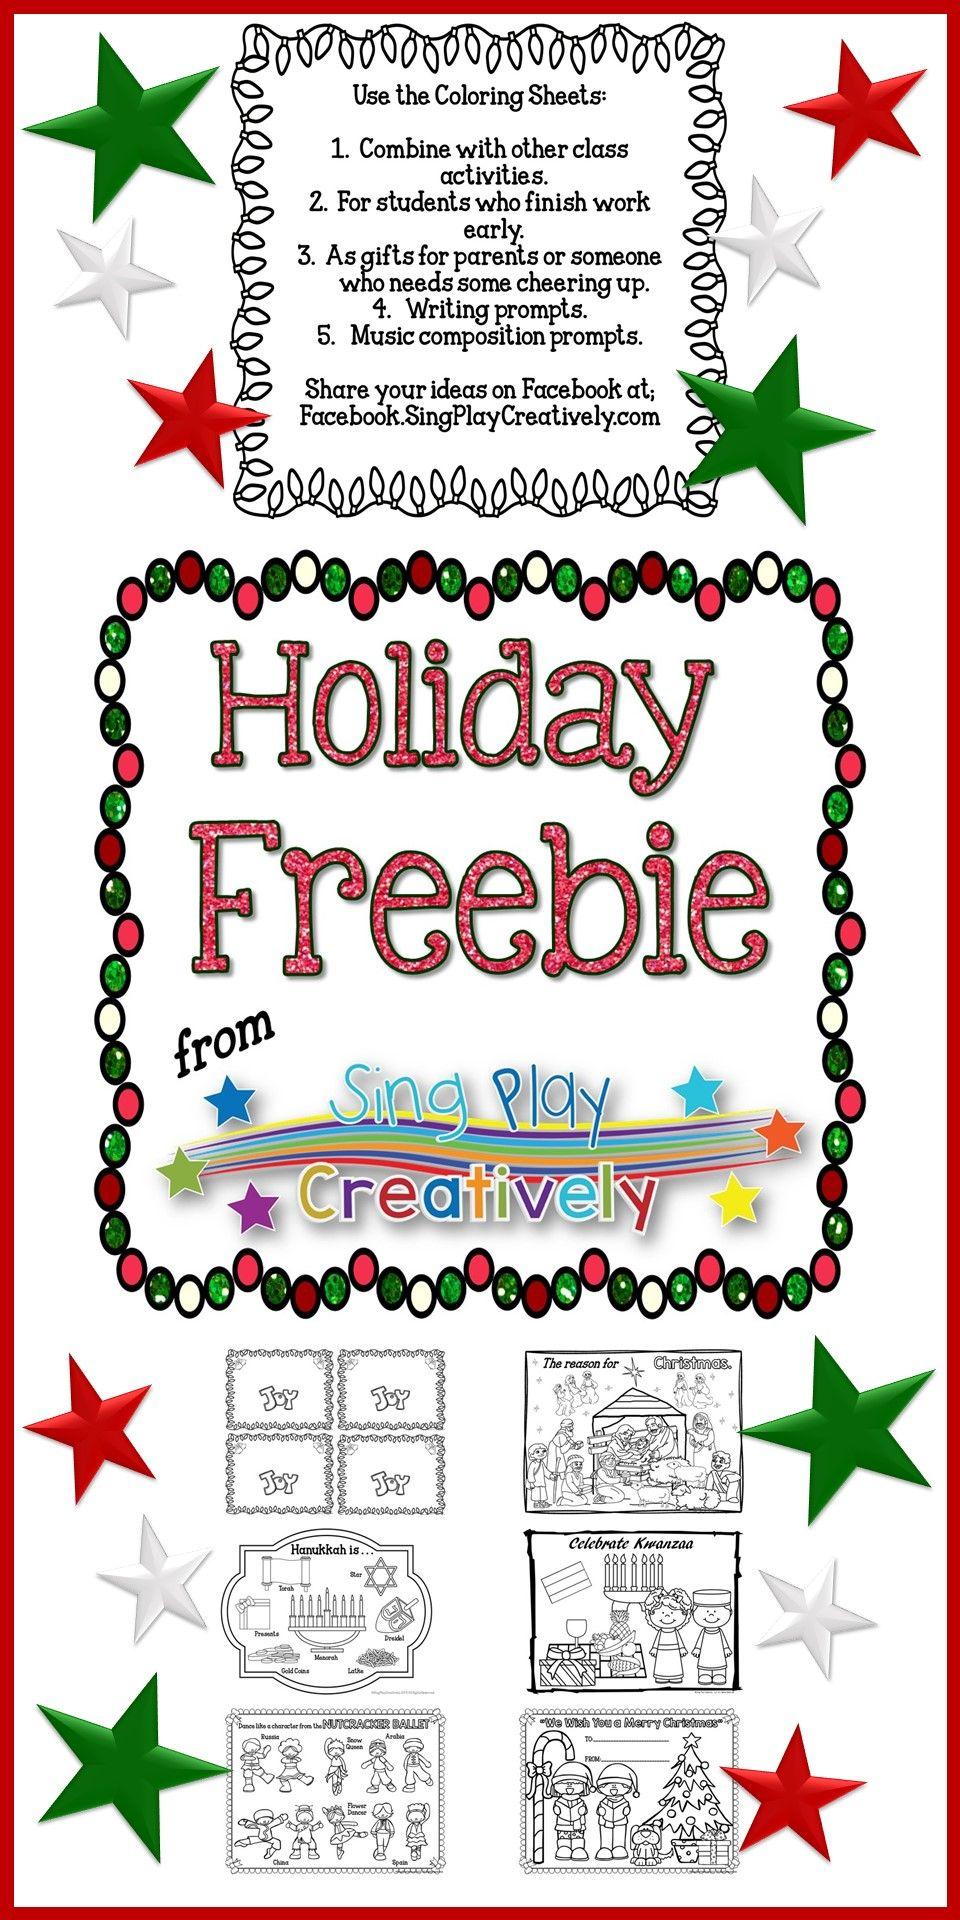 freebie holiday coloring sheets for kwaanza christmas